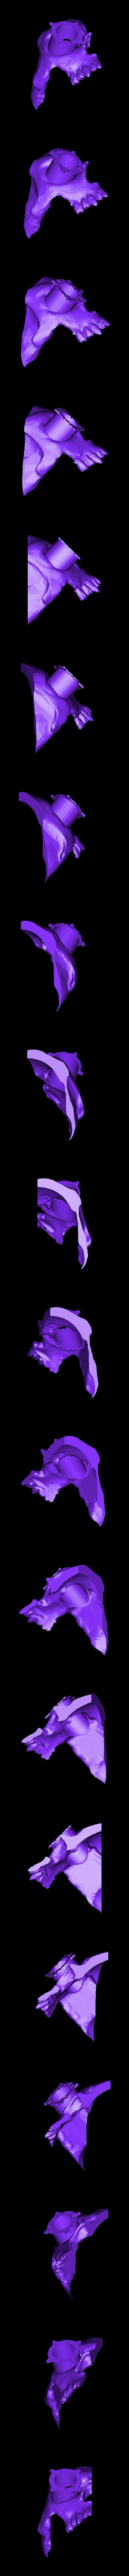 skull_main_V2_iris_goggles_repaired_Cut_1_Cut_1.stl Download free STL file Steampunk Skull helmet V2 • 3D printer design, cube606592